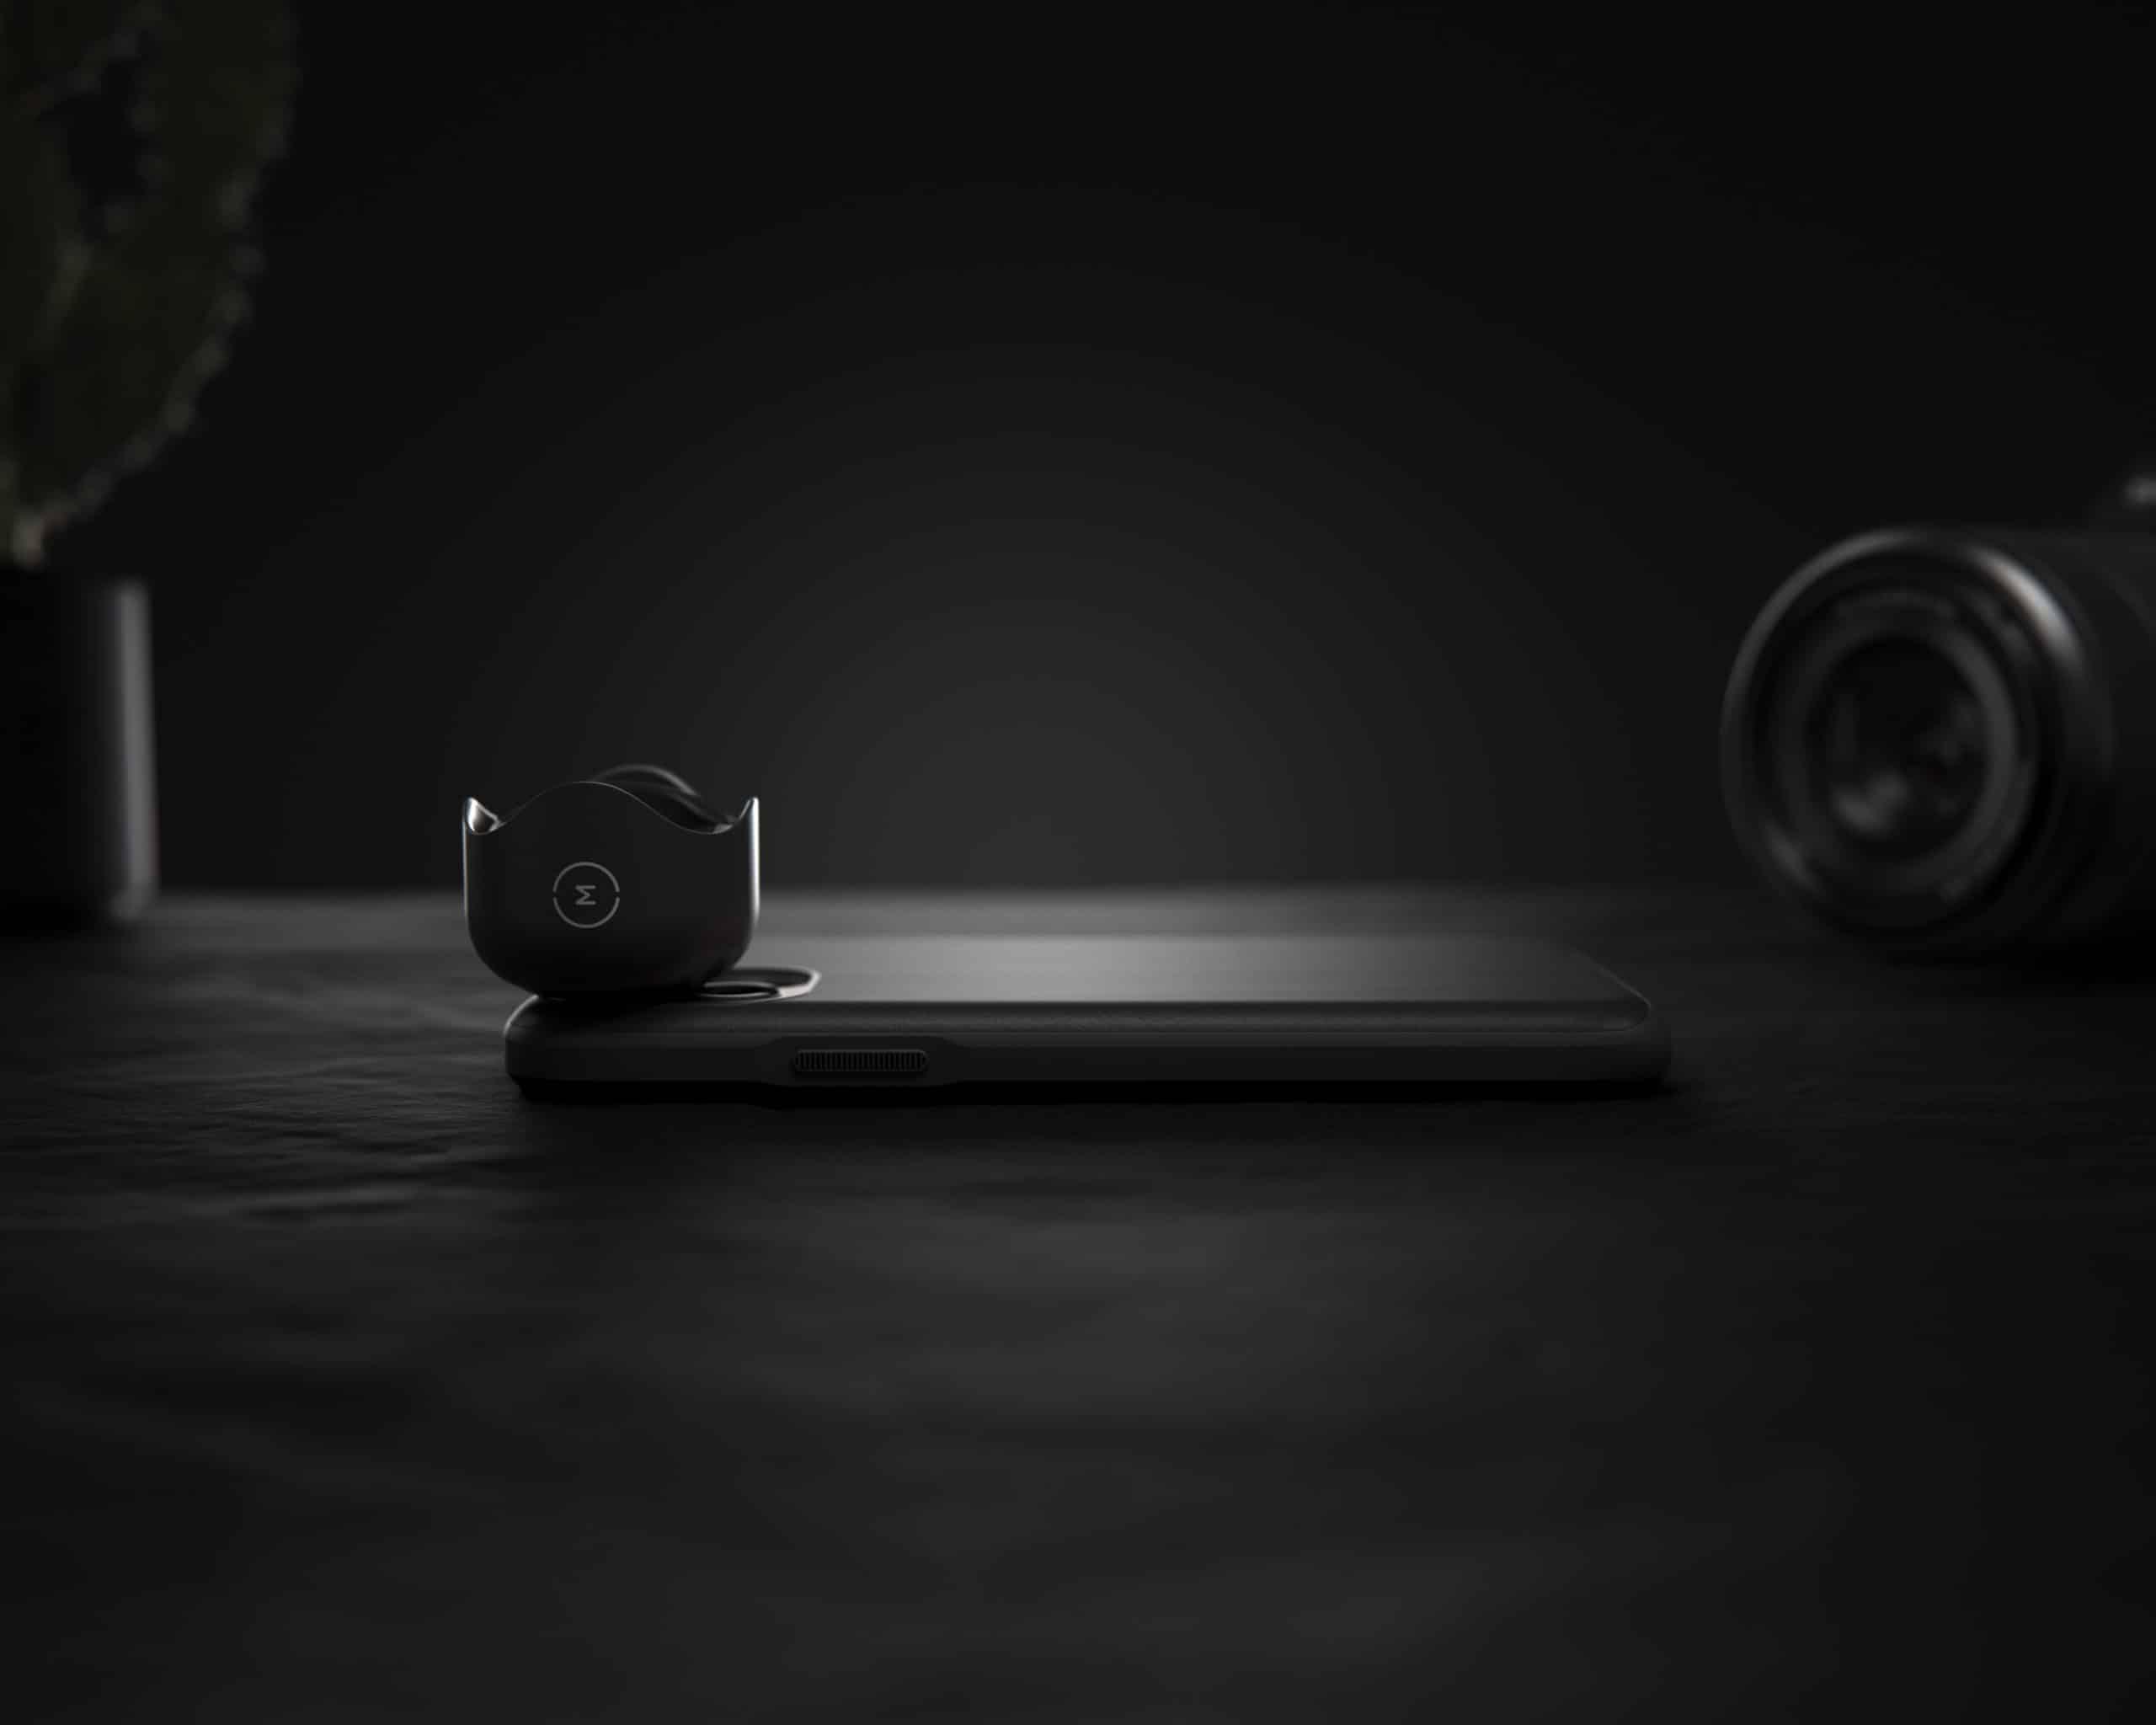 Case da Nomad equipada com lente da Moment (lateral)